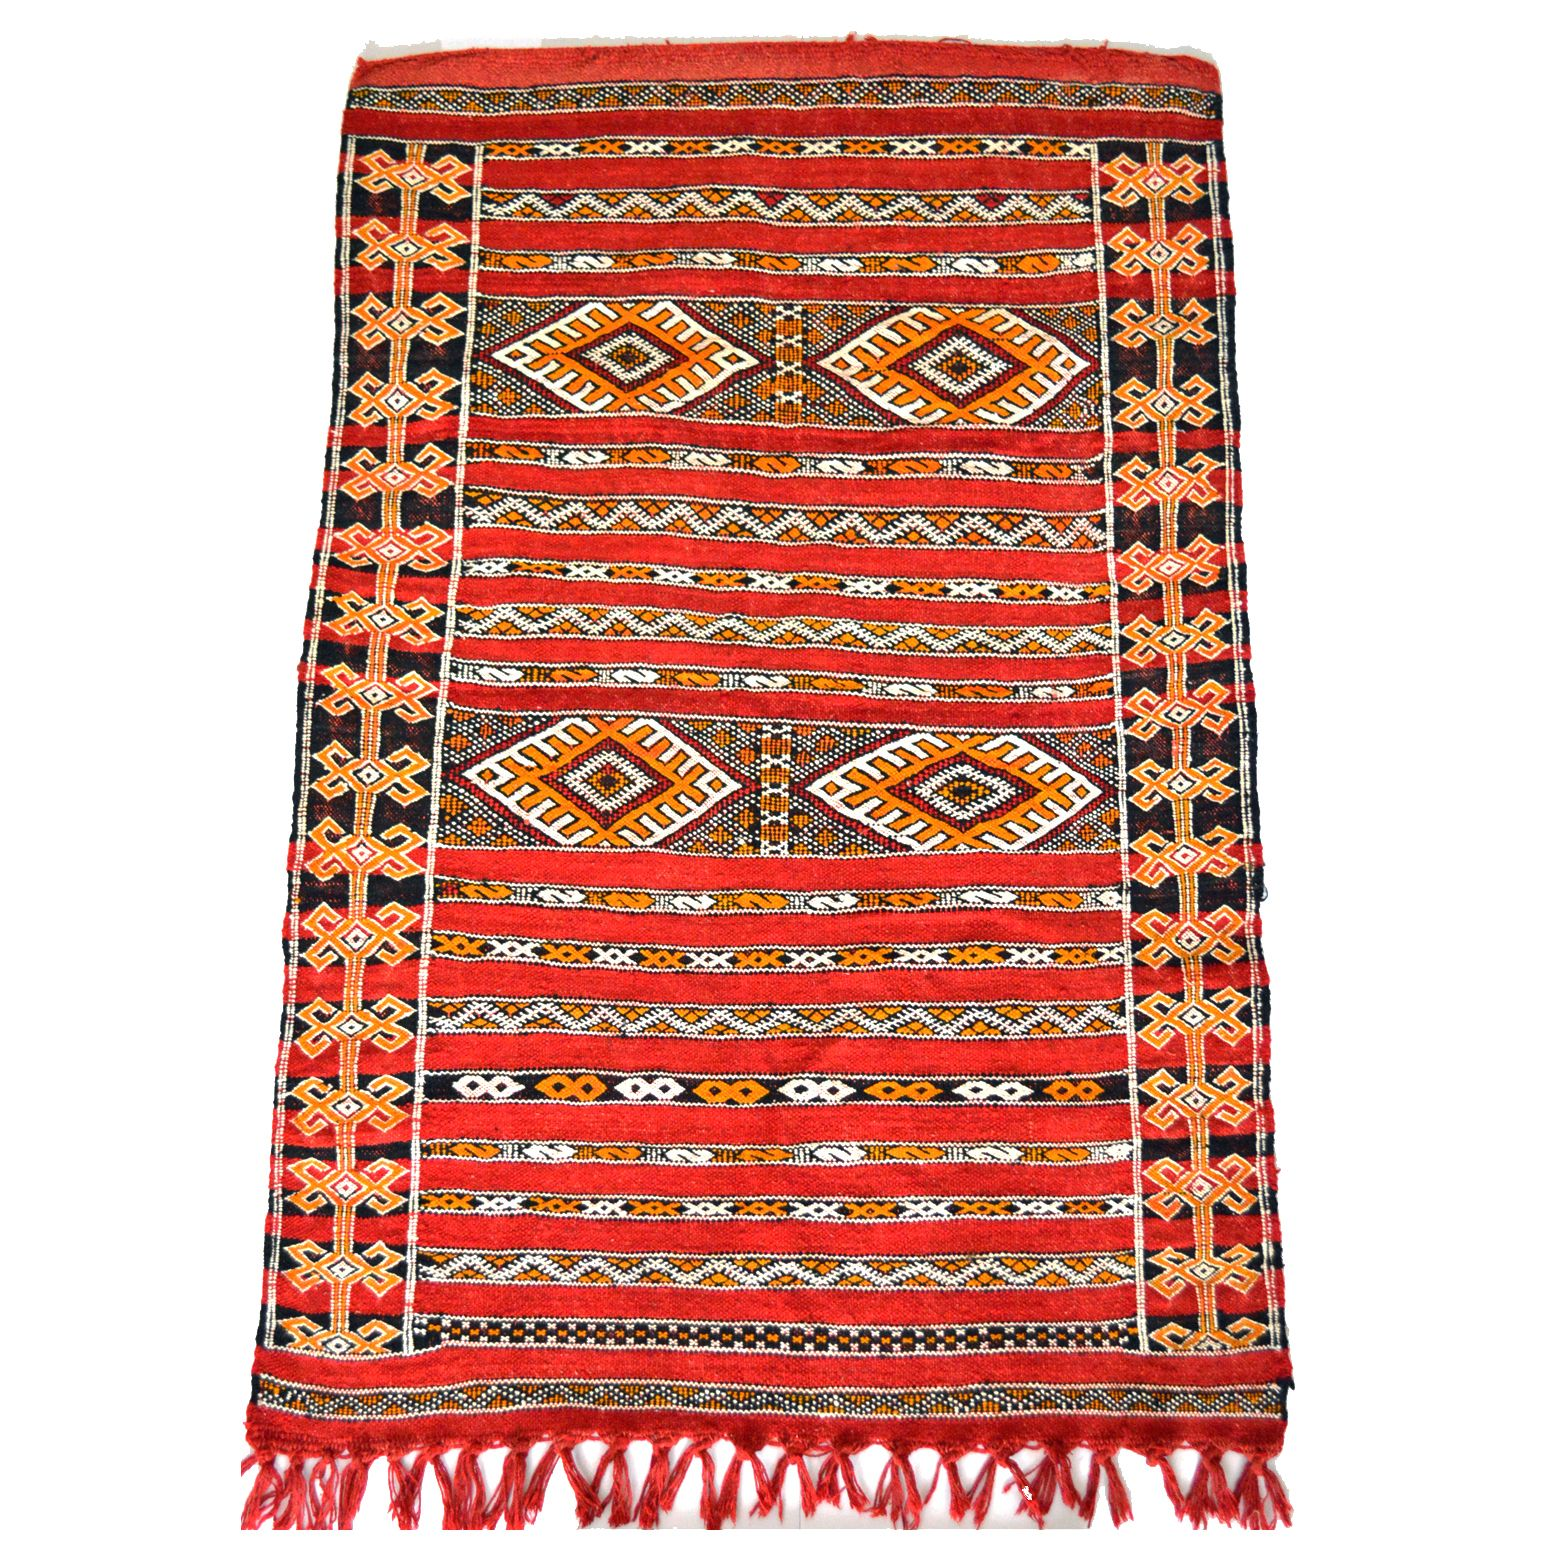 Amazing Hand Woven Moroccan Kilim Rug (3u0027 X 4.6u0027)